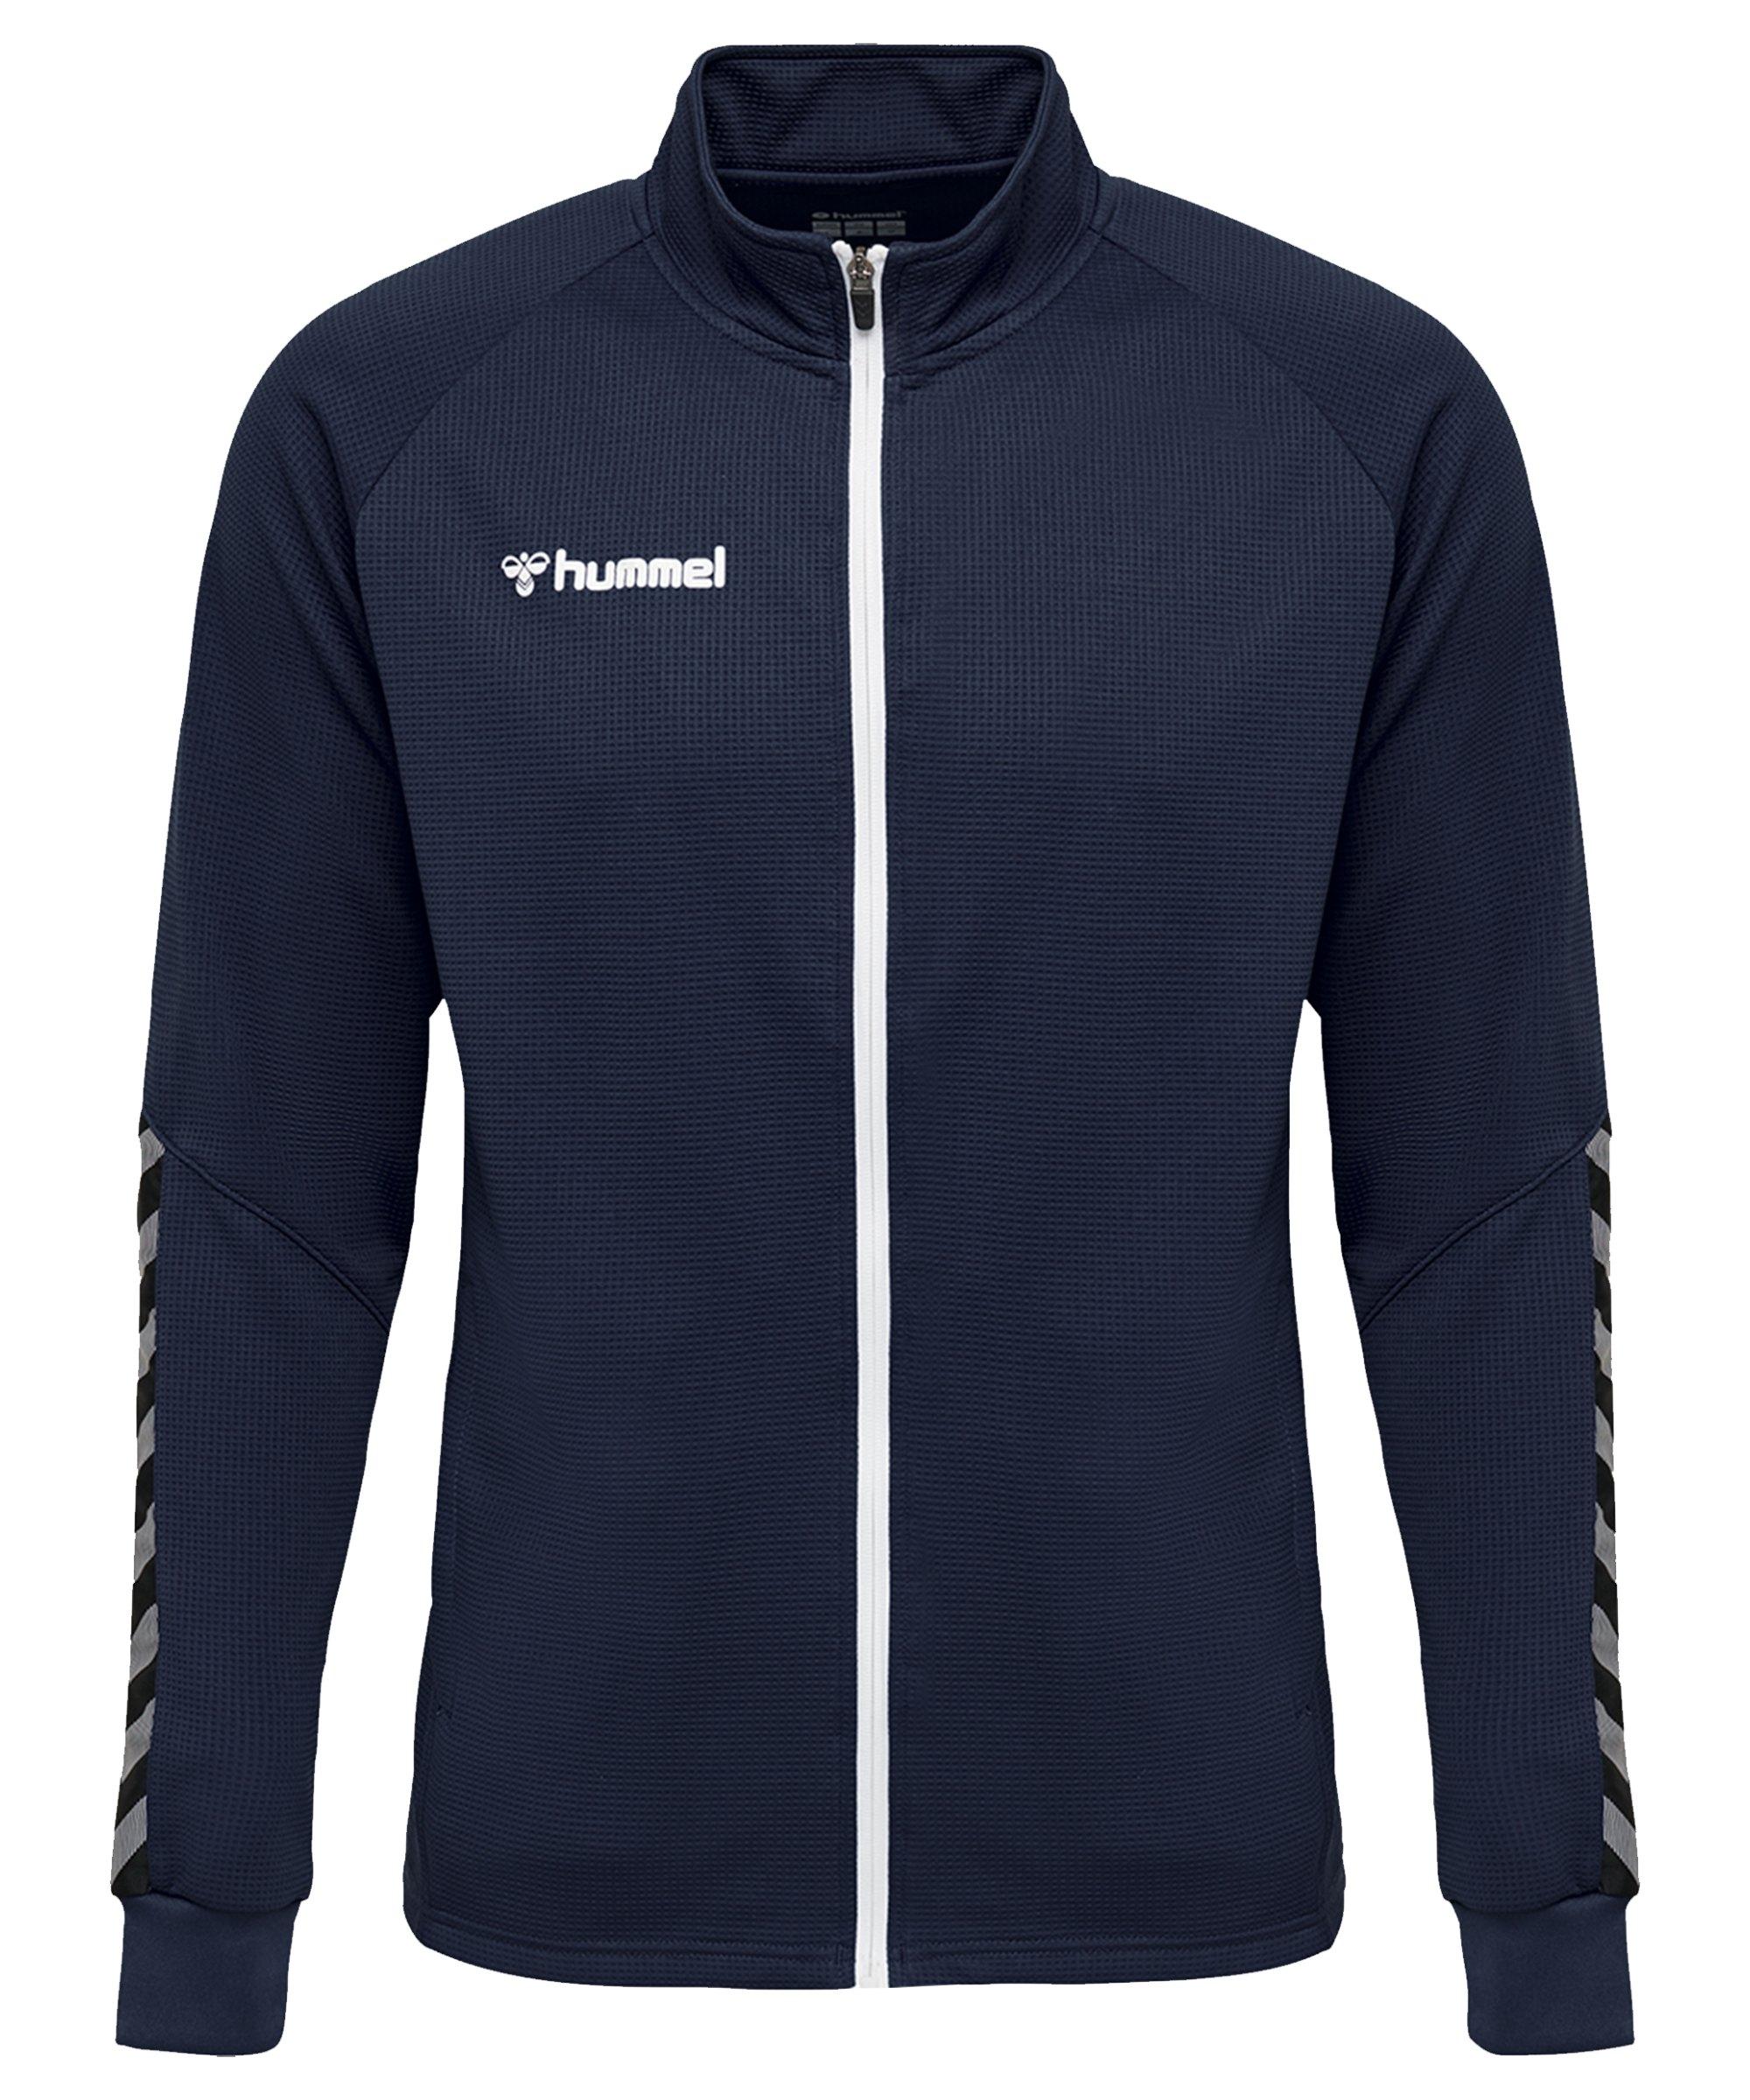 Hummel Authentic Poly Trainingsjacke Blau F7026 - blau